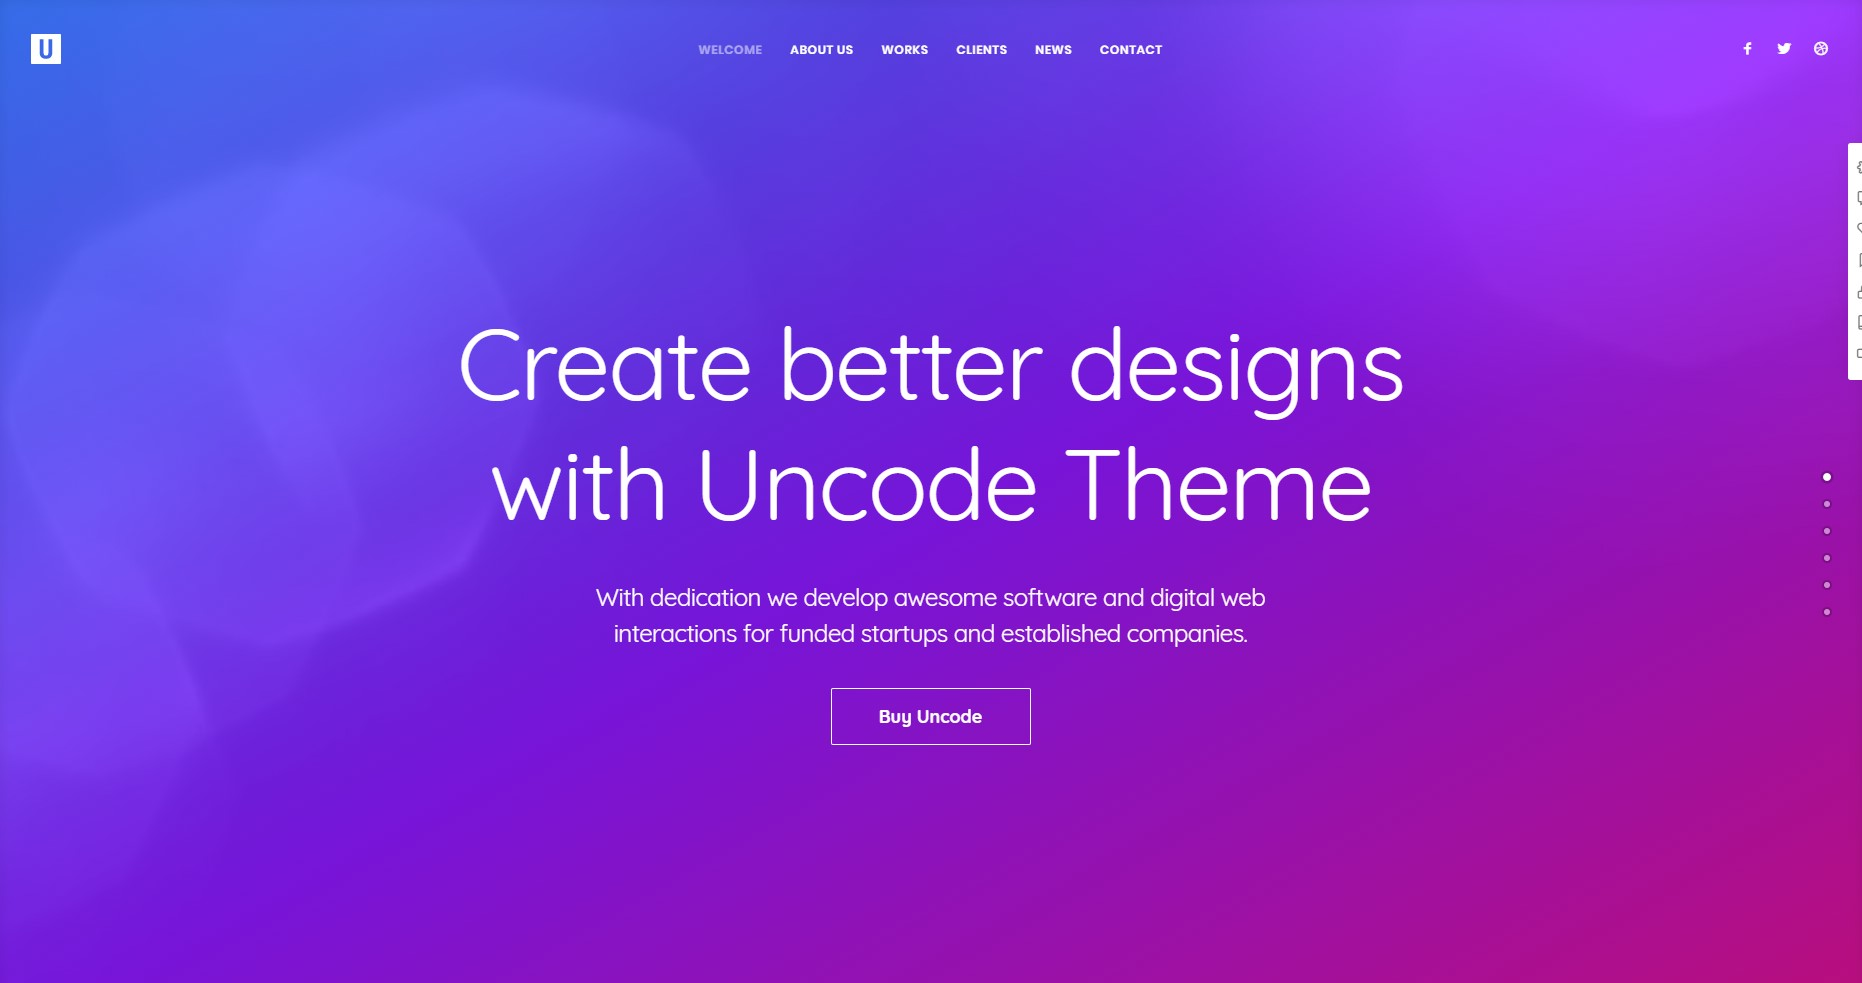 Uncode minimalist WordPress Theme